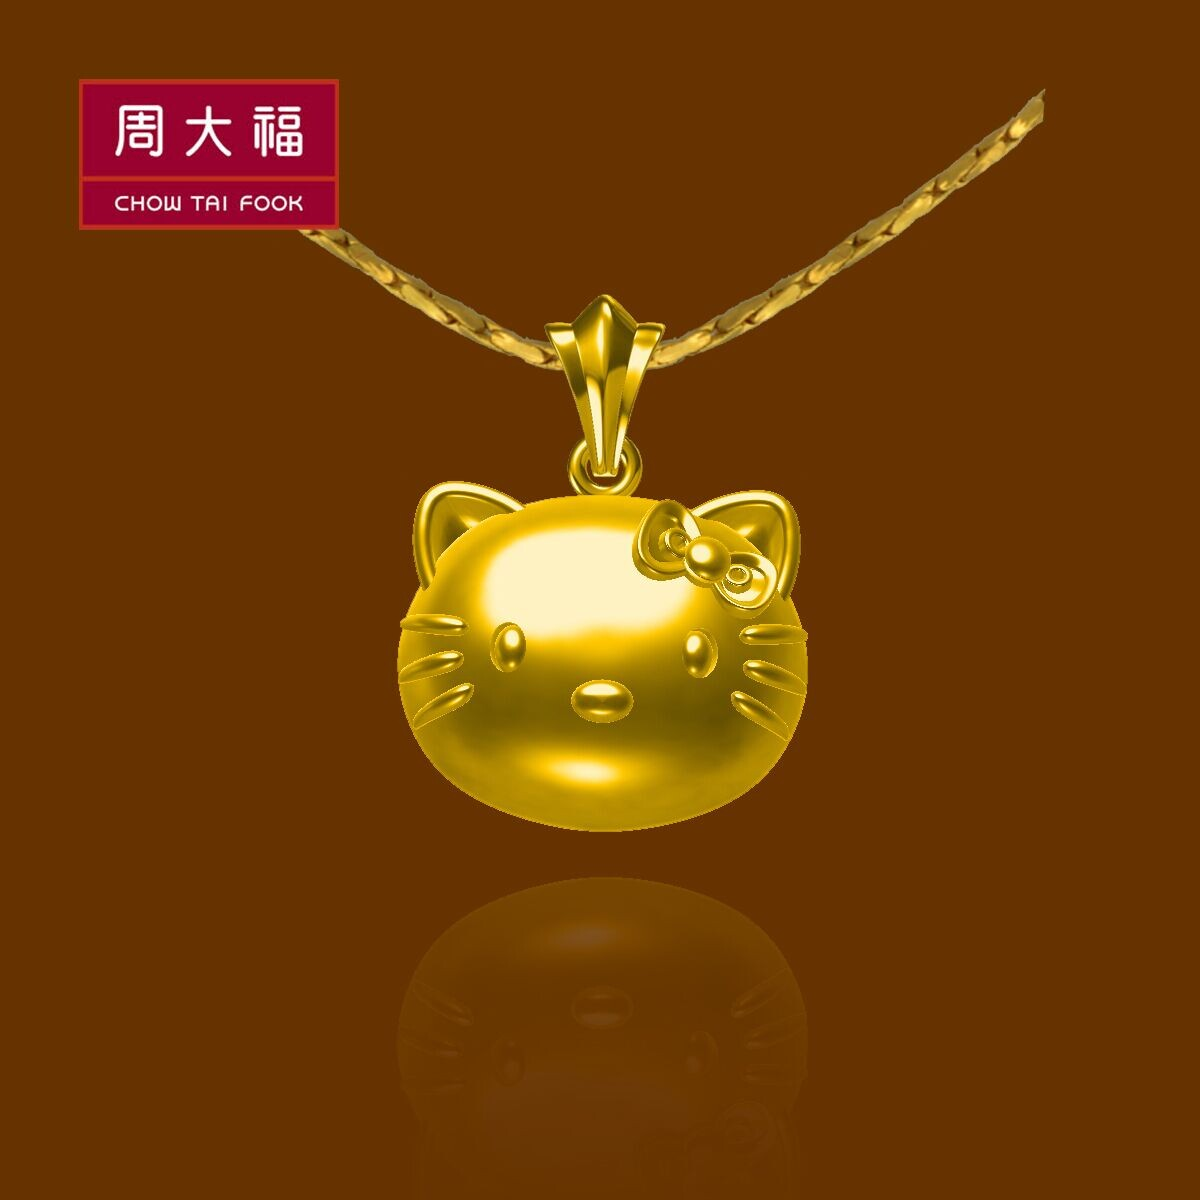 купить Ожерелье Chow Tai Fook  18K недорого